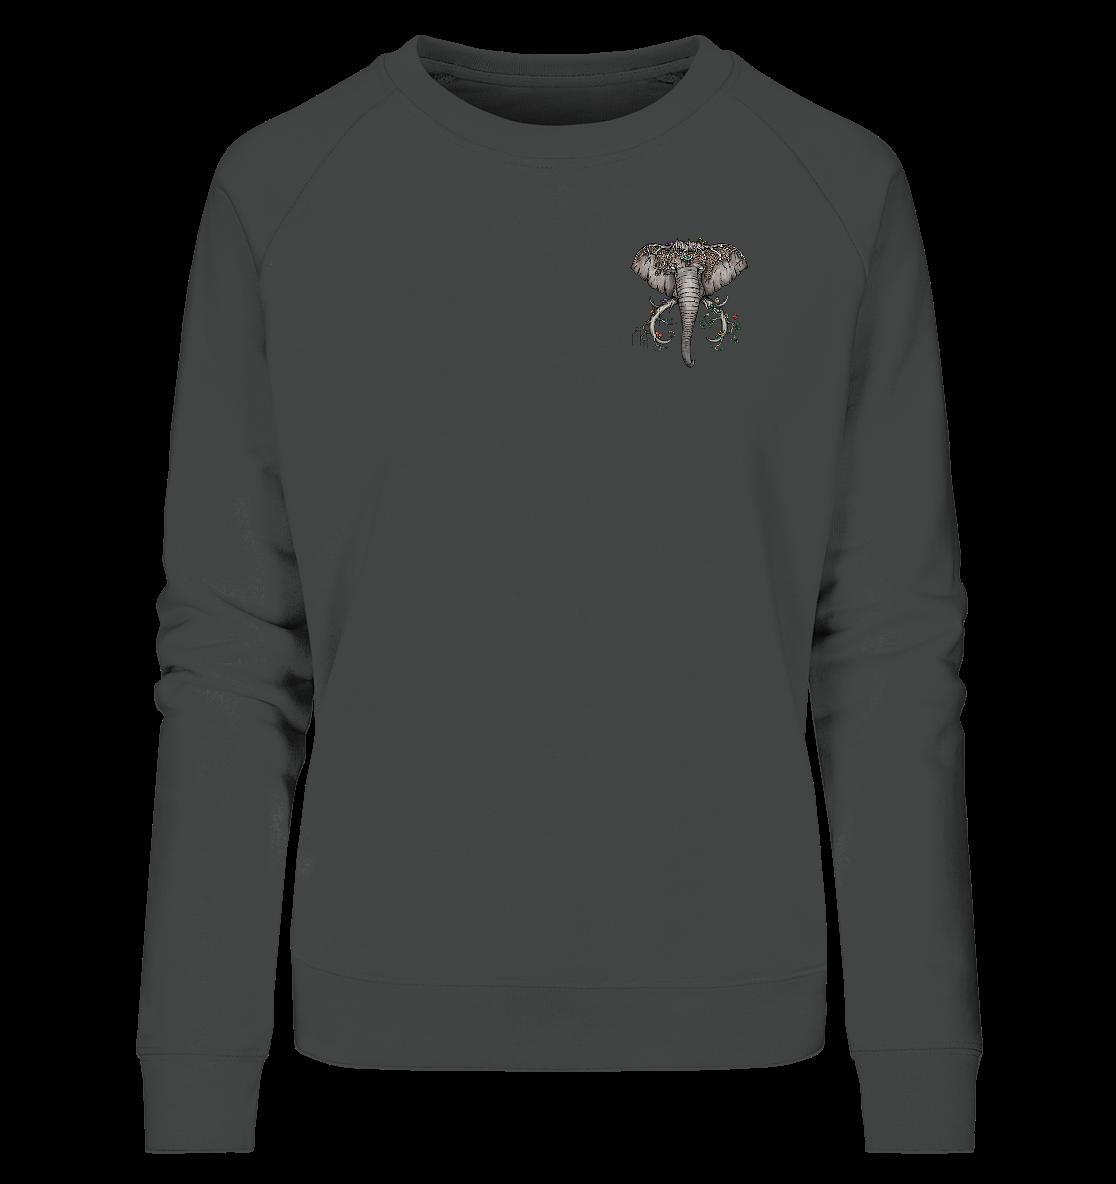 front-ladies-organic-sweatshirt-444545-1116x-2.png